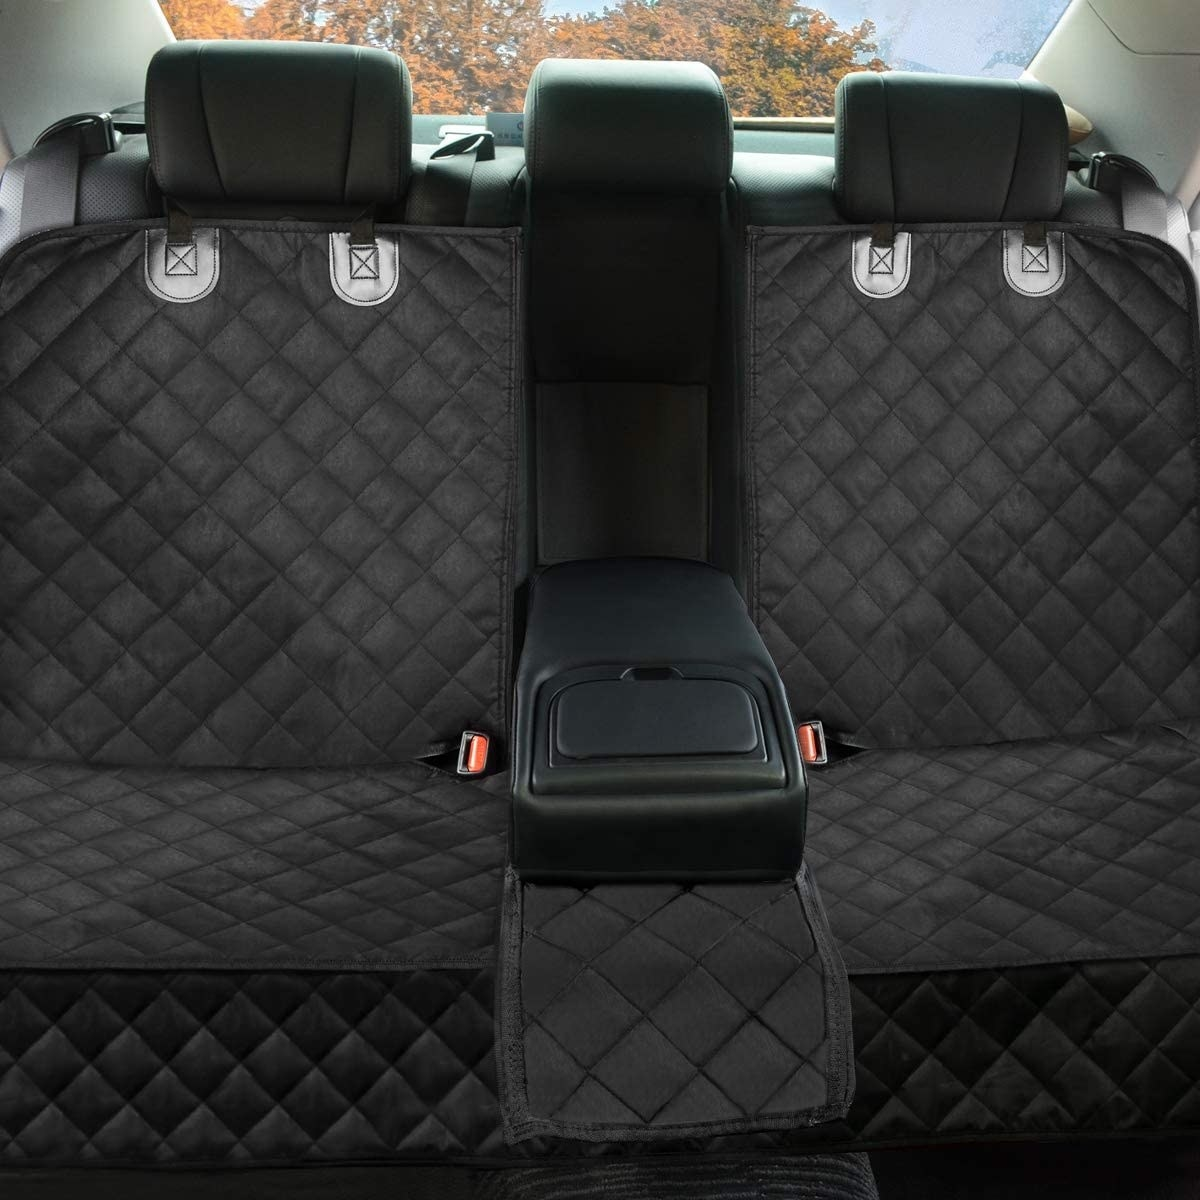 car protectors on backseat